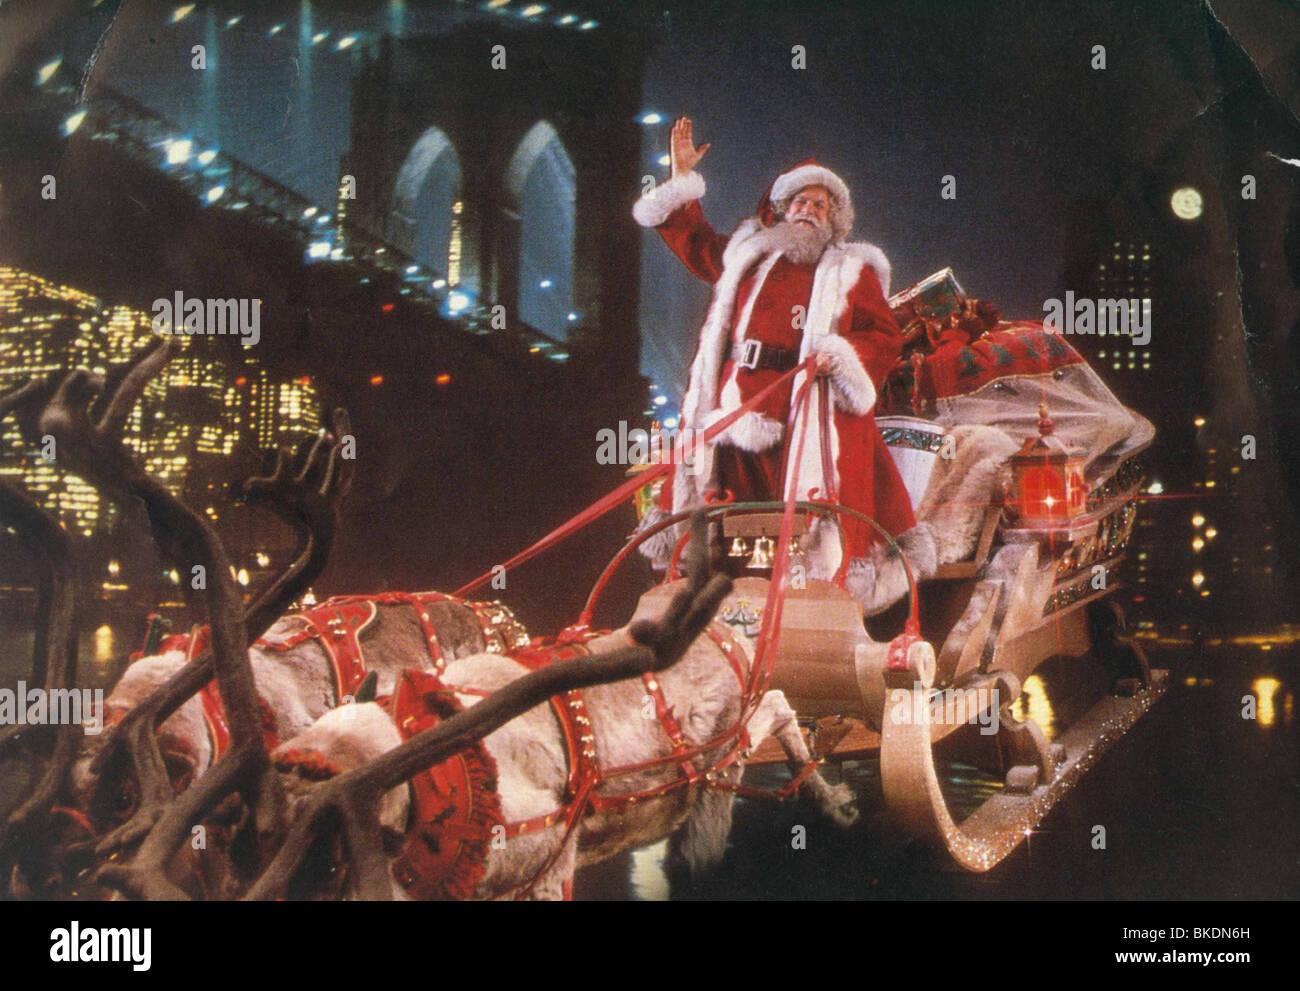 SANTA CLAUS: THE MOVIE (1985) DAVID HUDDLESTON STMV 001FOH - Stock Image